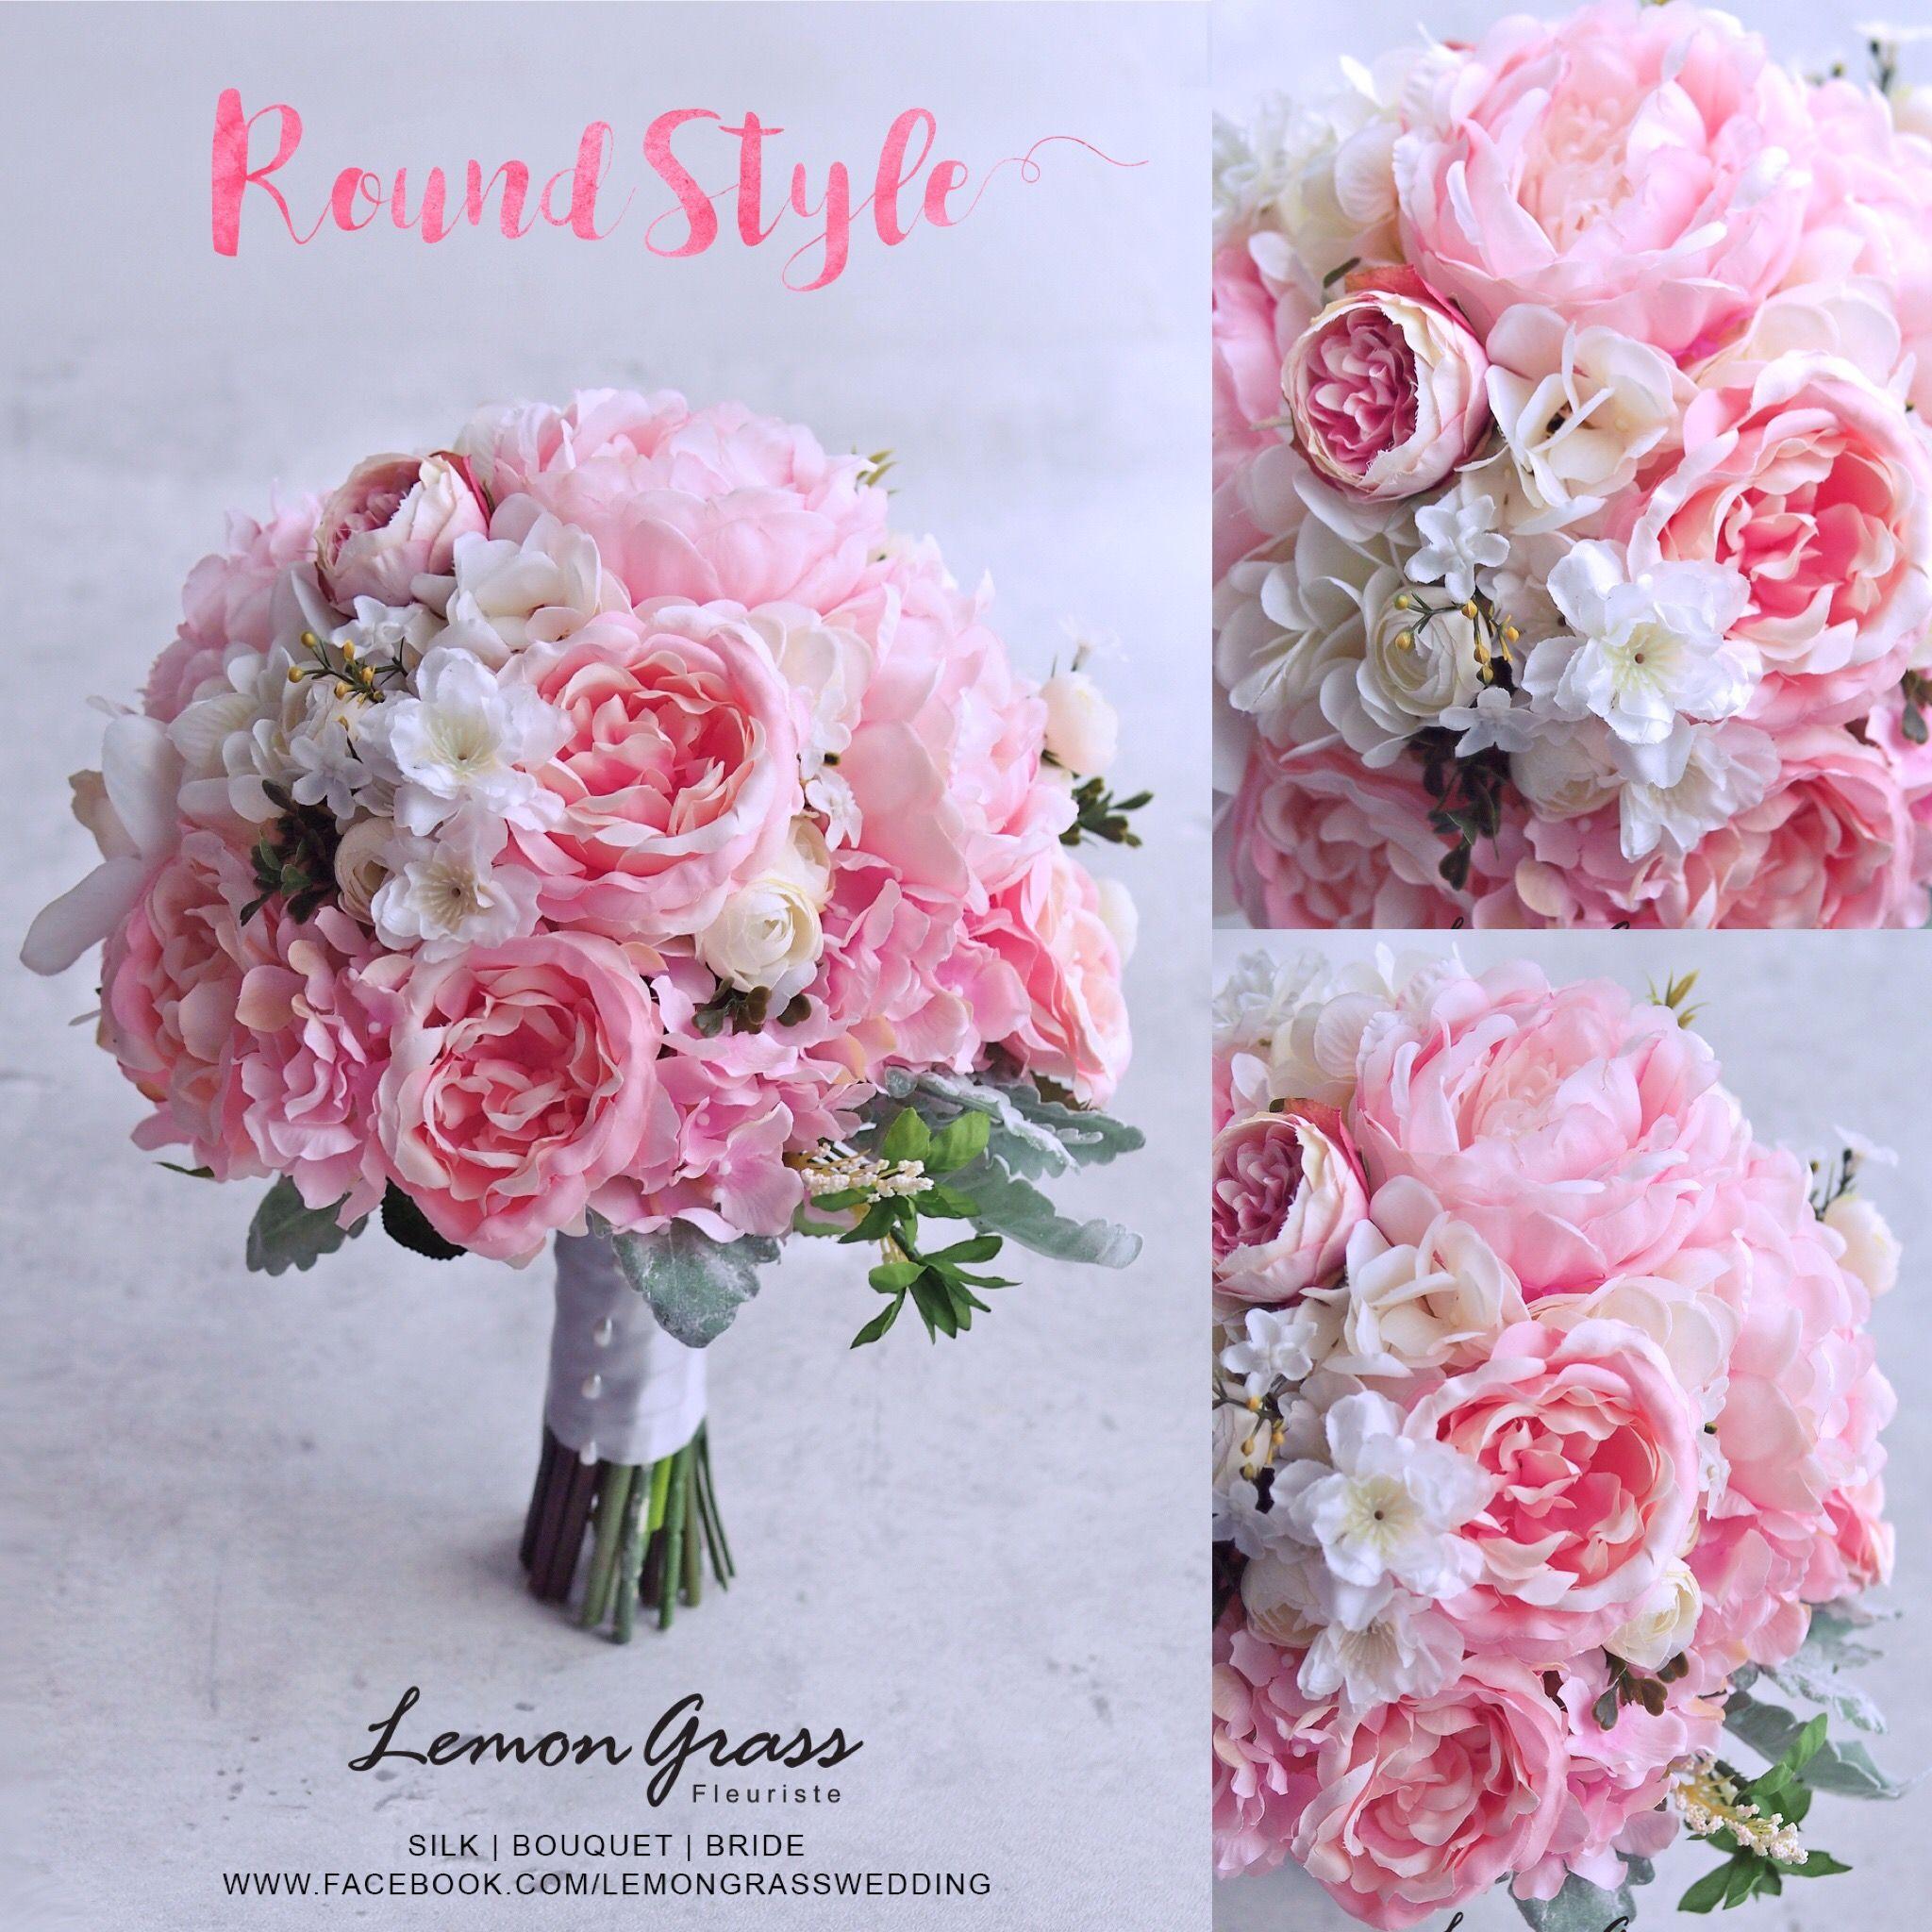 Pin By Lemongrasswedding On Silk Flower Bouquets Pinterest Bride